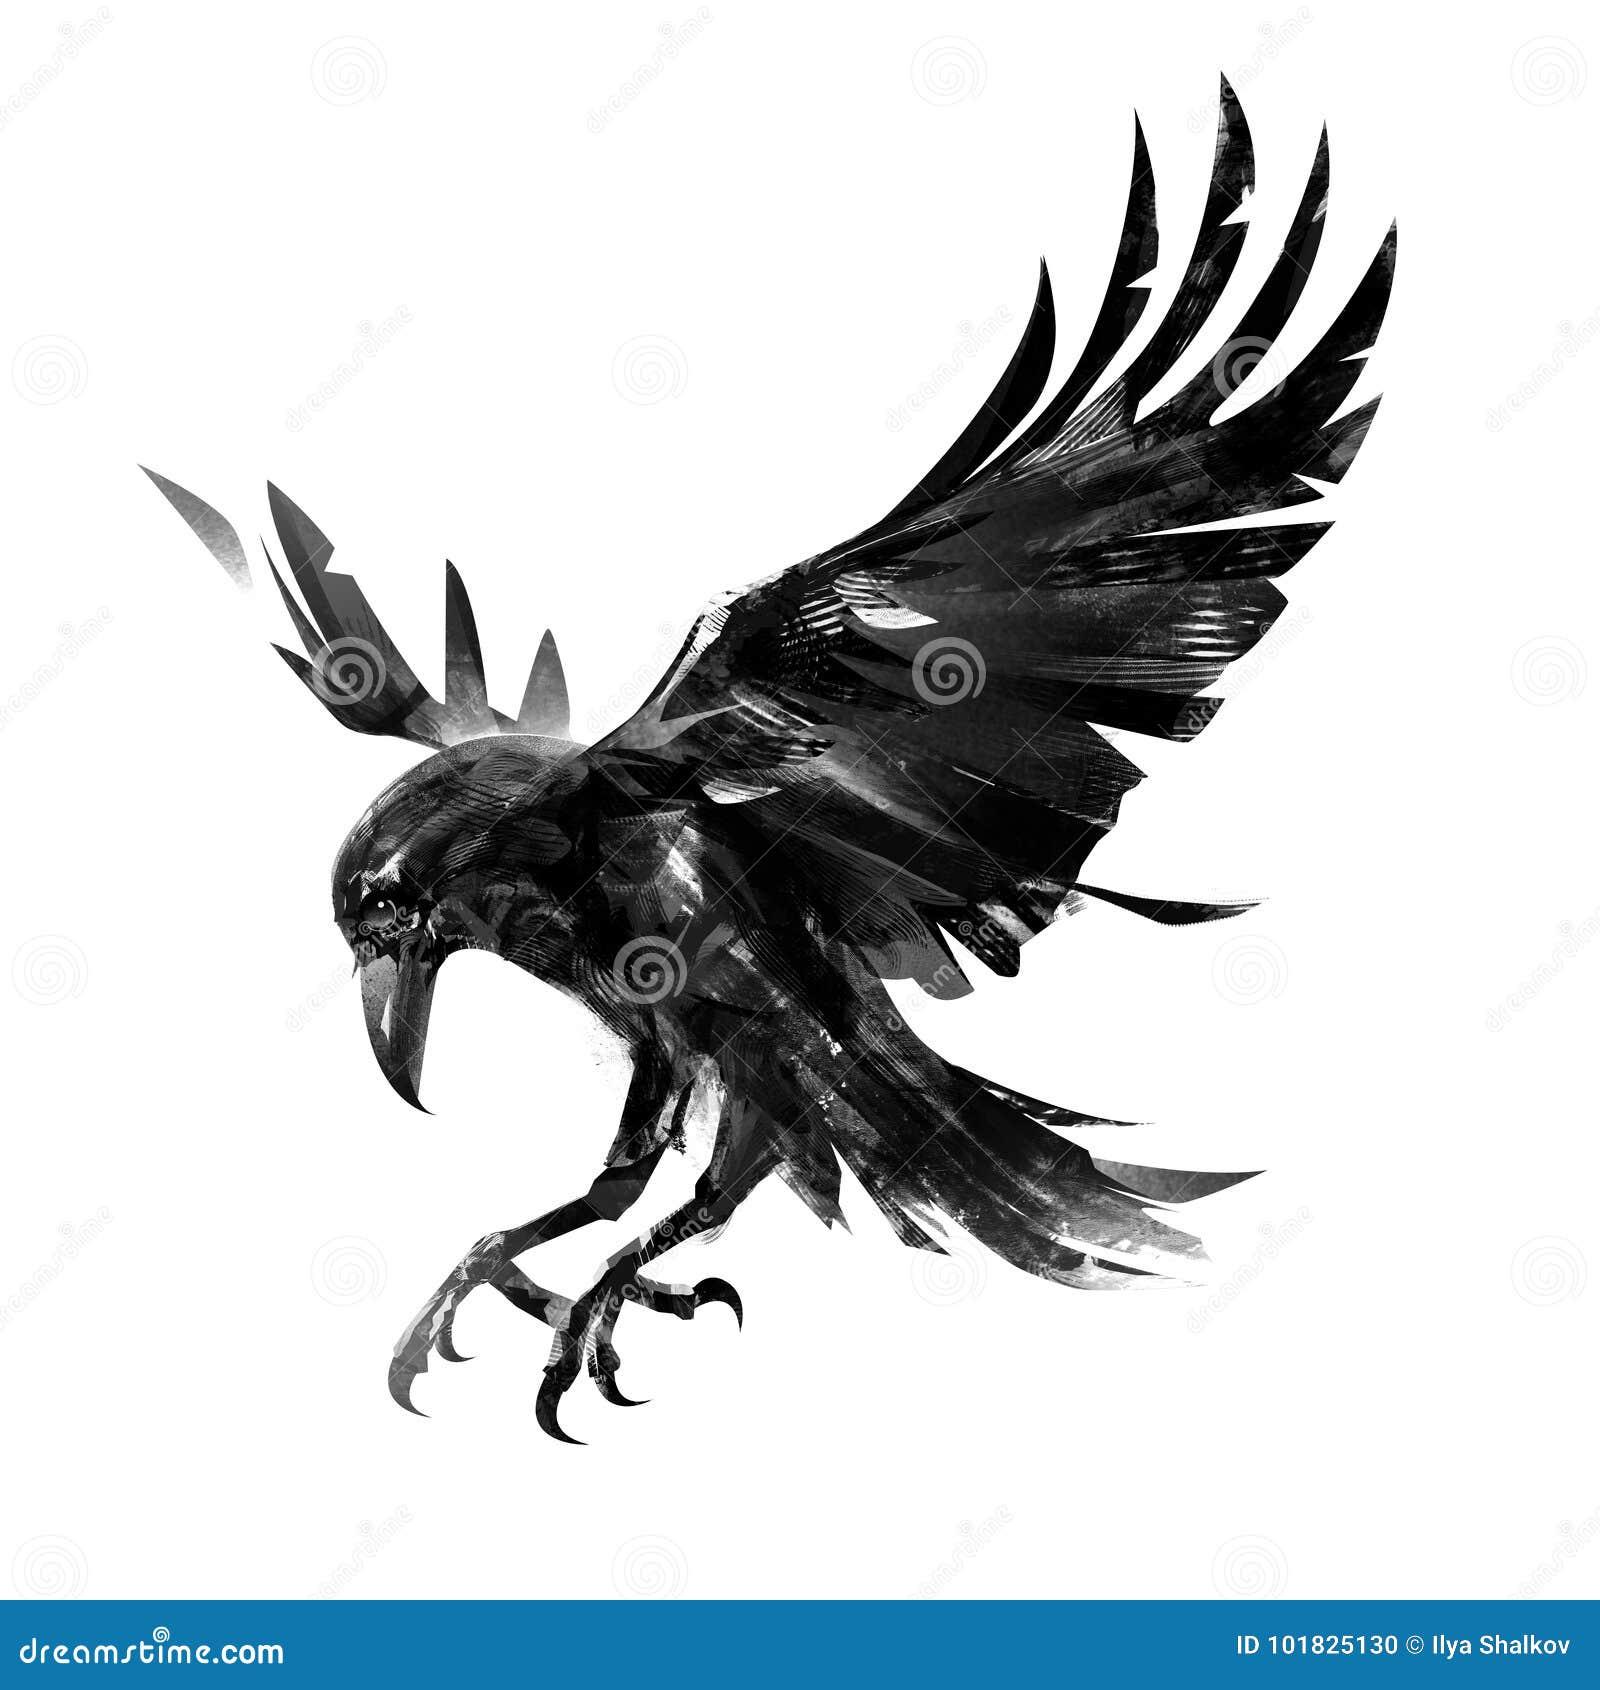 Crow Graphic Design